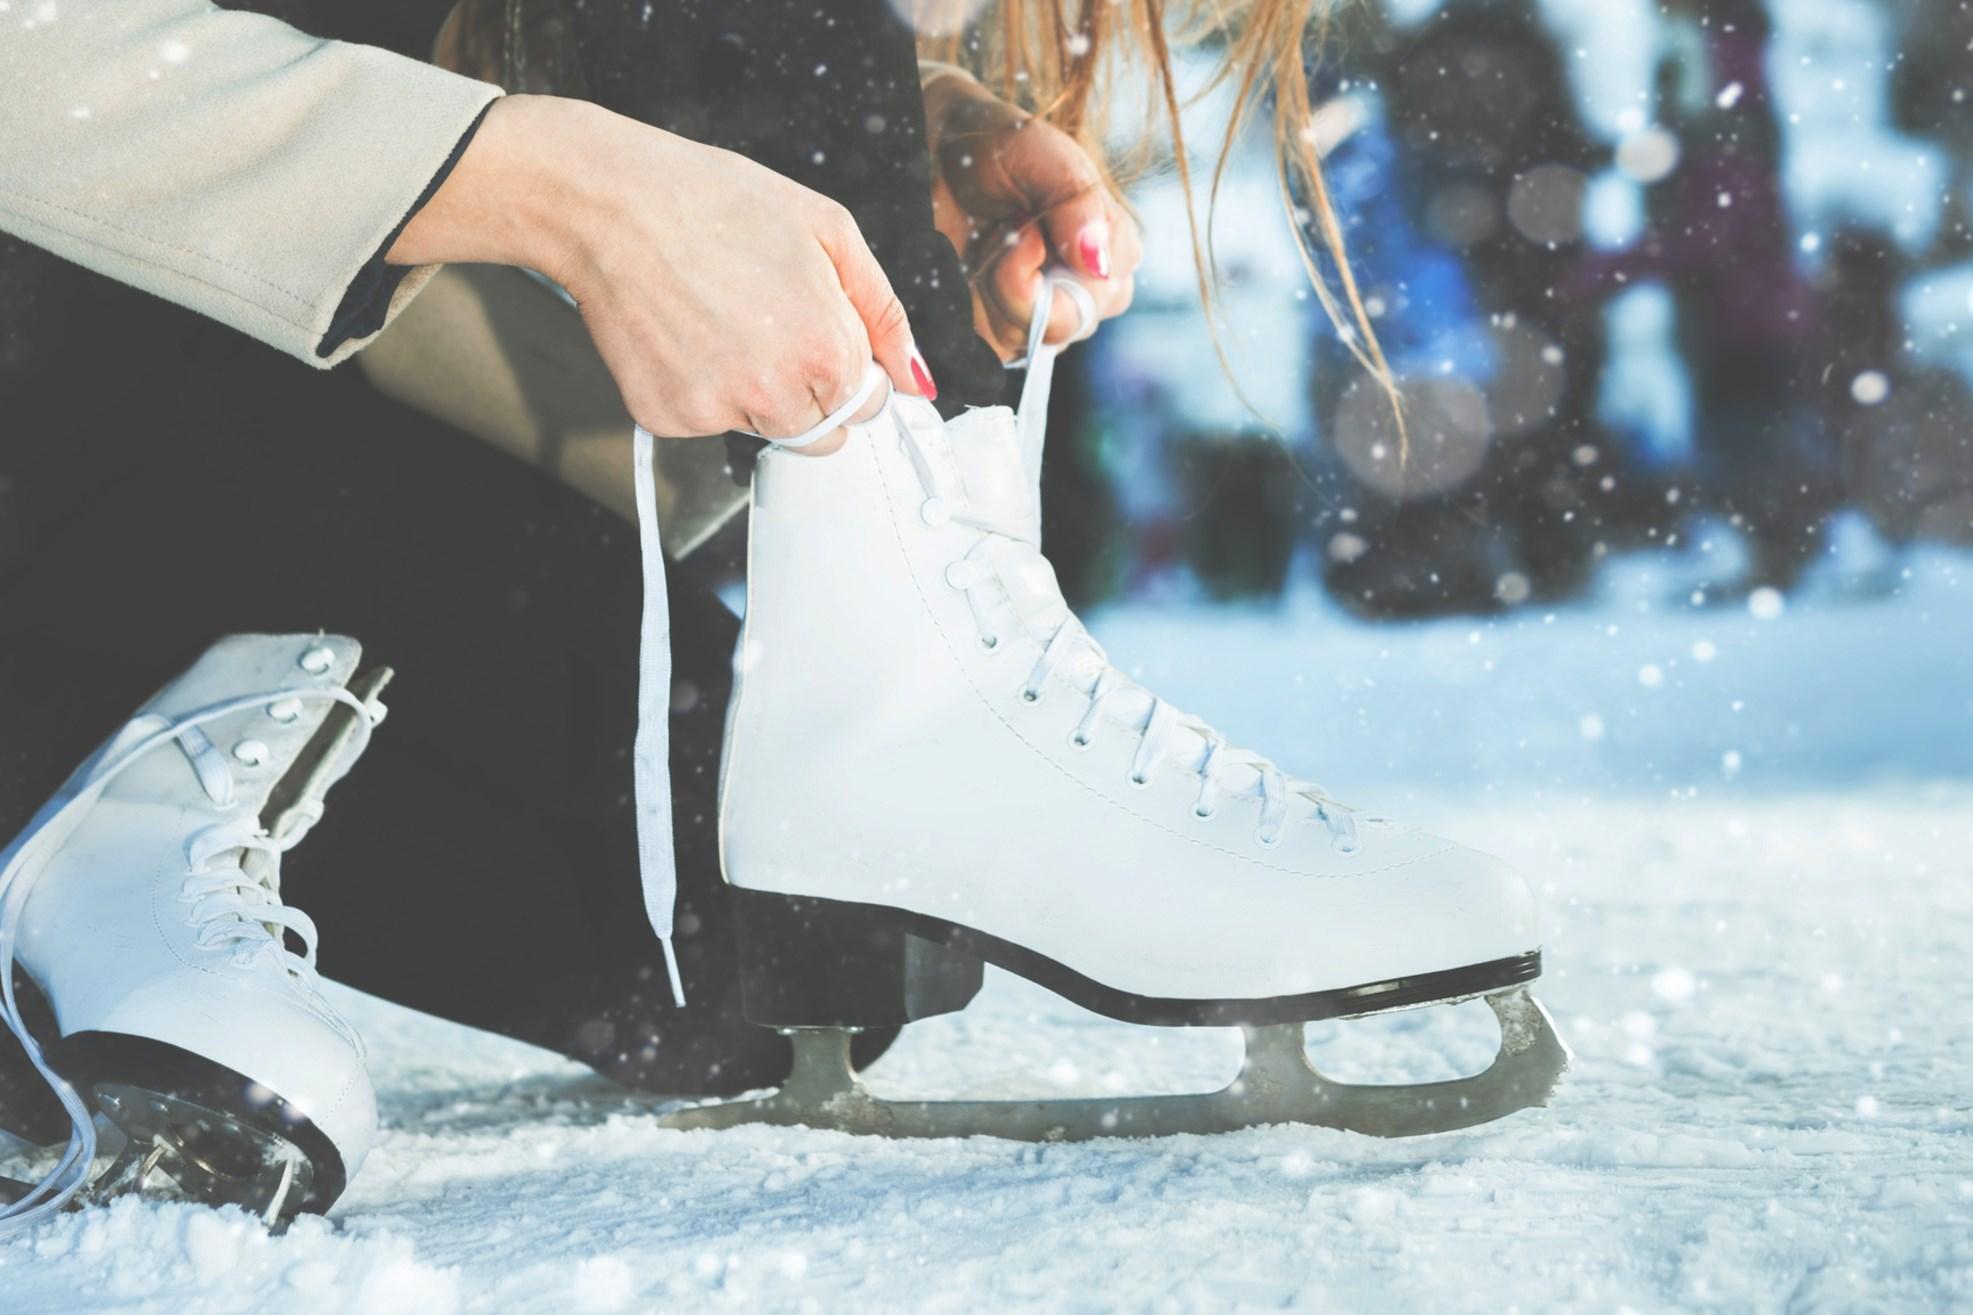 The Best Outdoor Ice Skating Rinks In St Petersburg Destination Guides Corinthia St Petersburg Corinthia